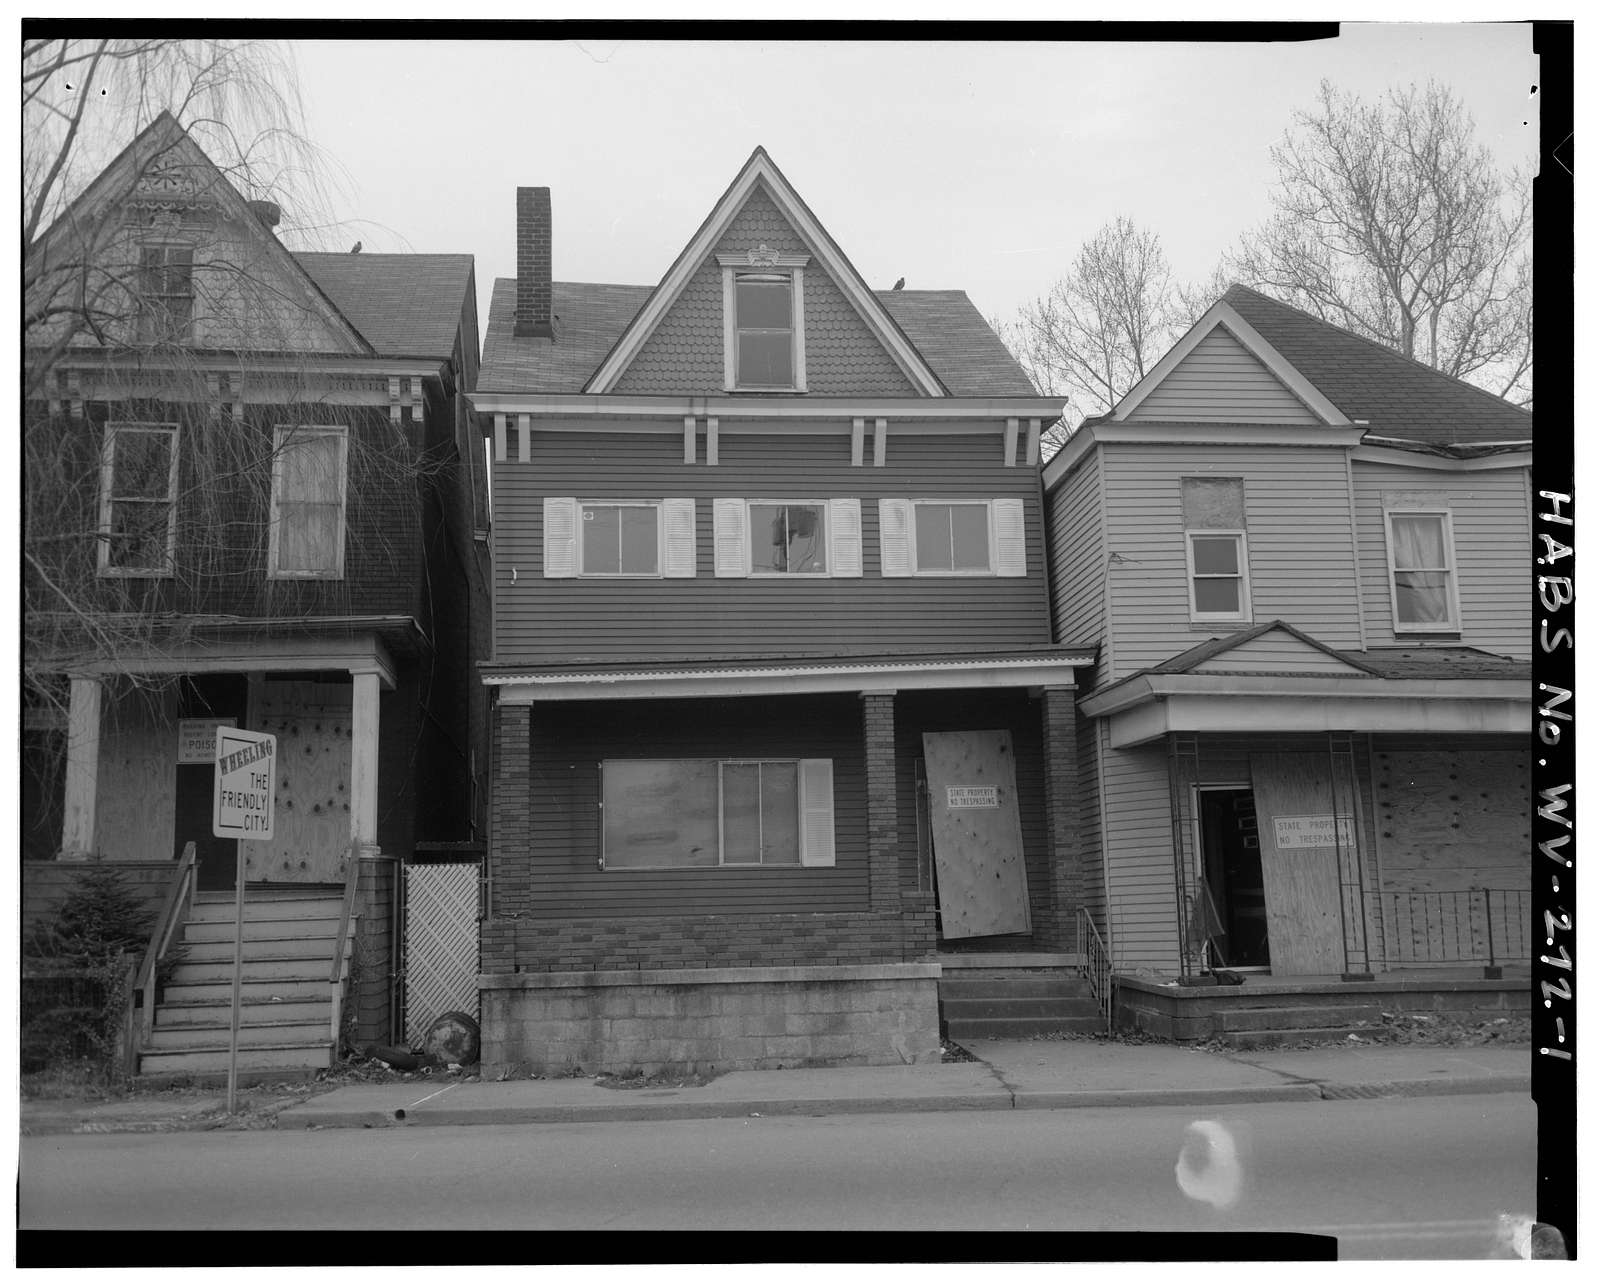 176 Zane Street (House), Wheeling, Ohio County, WV